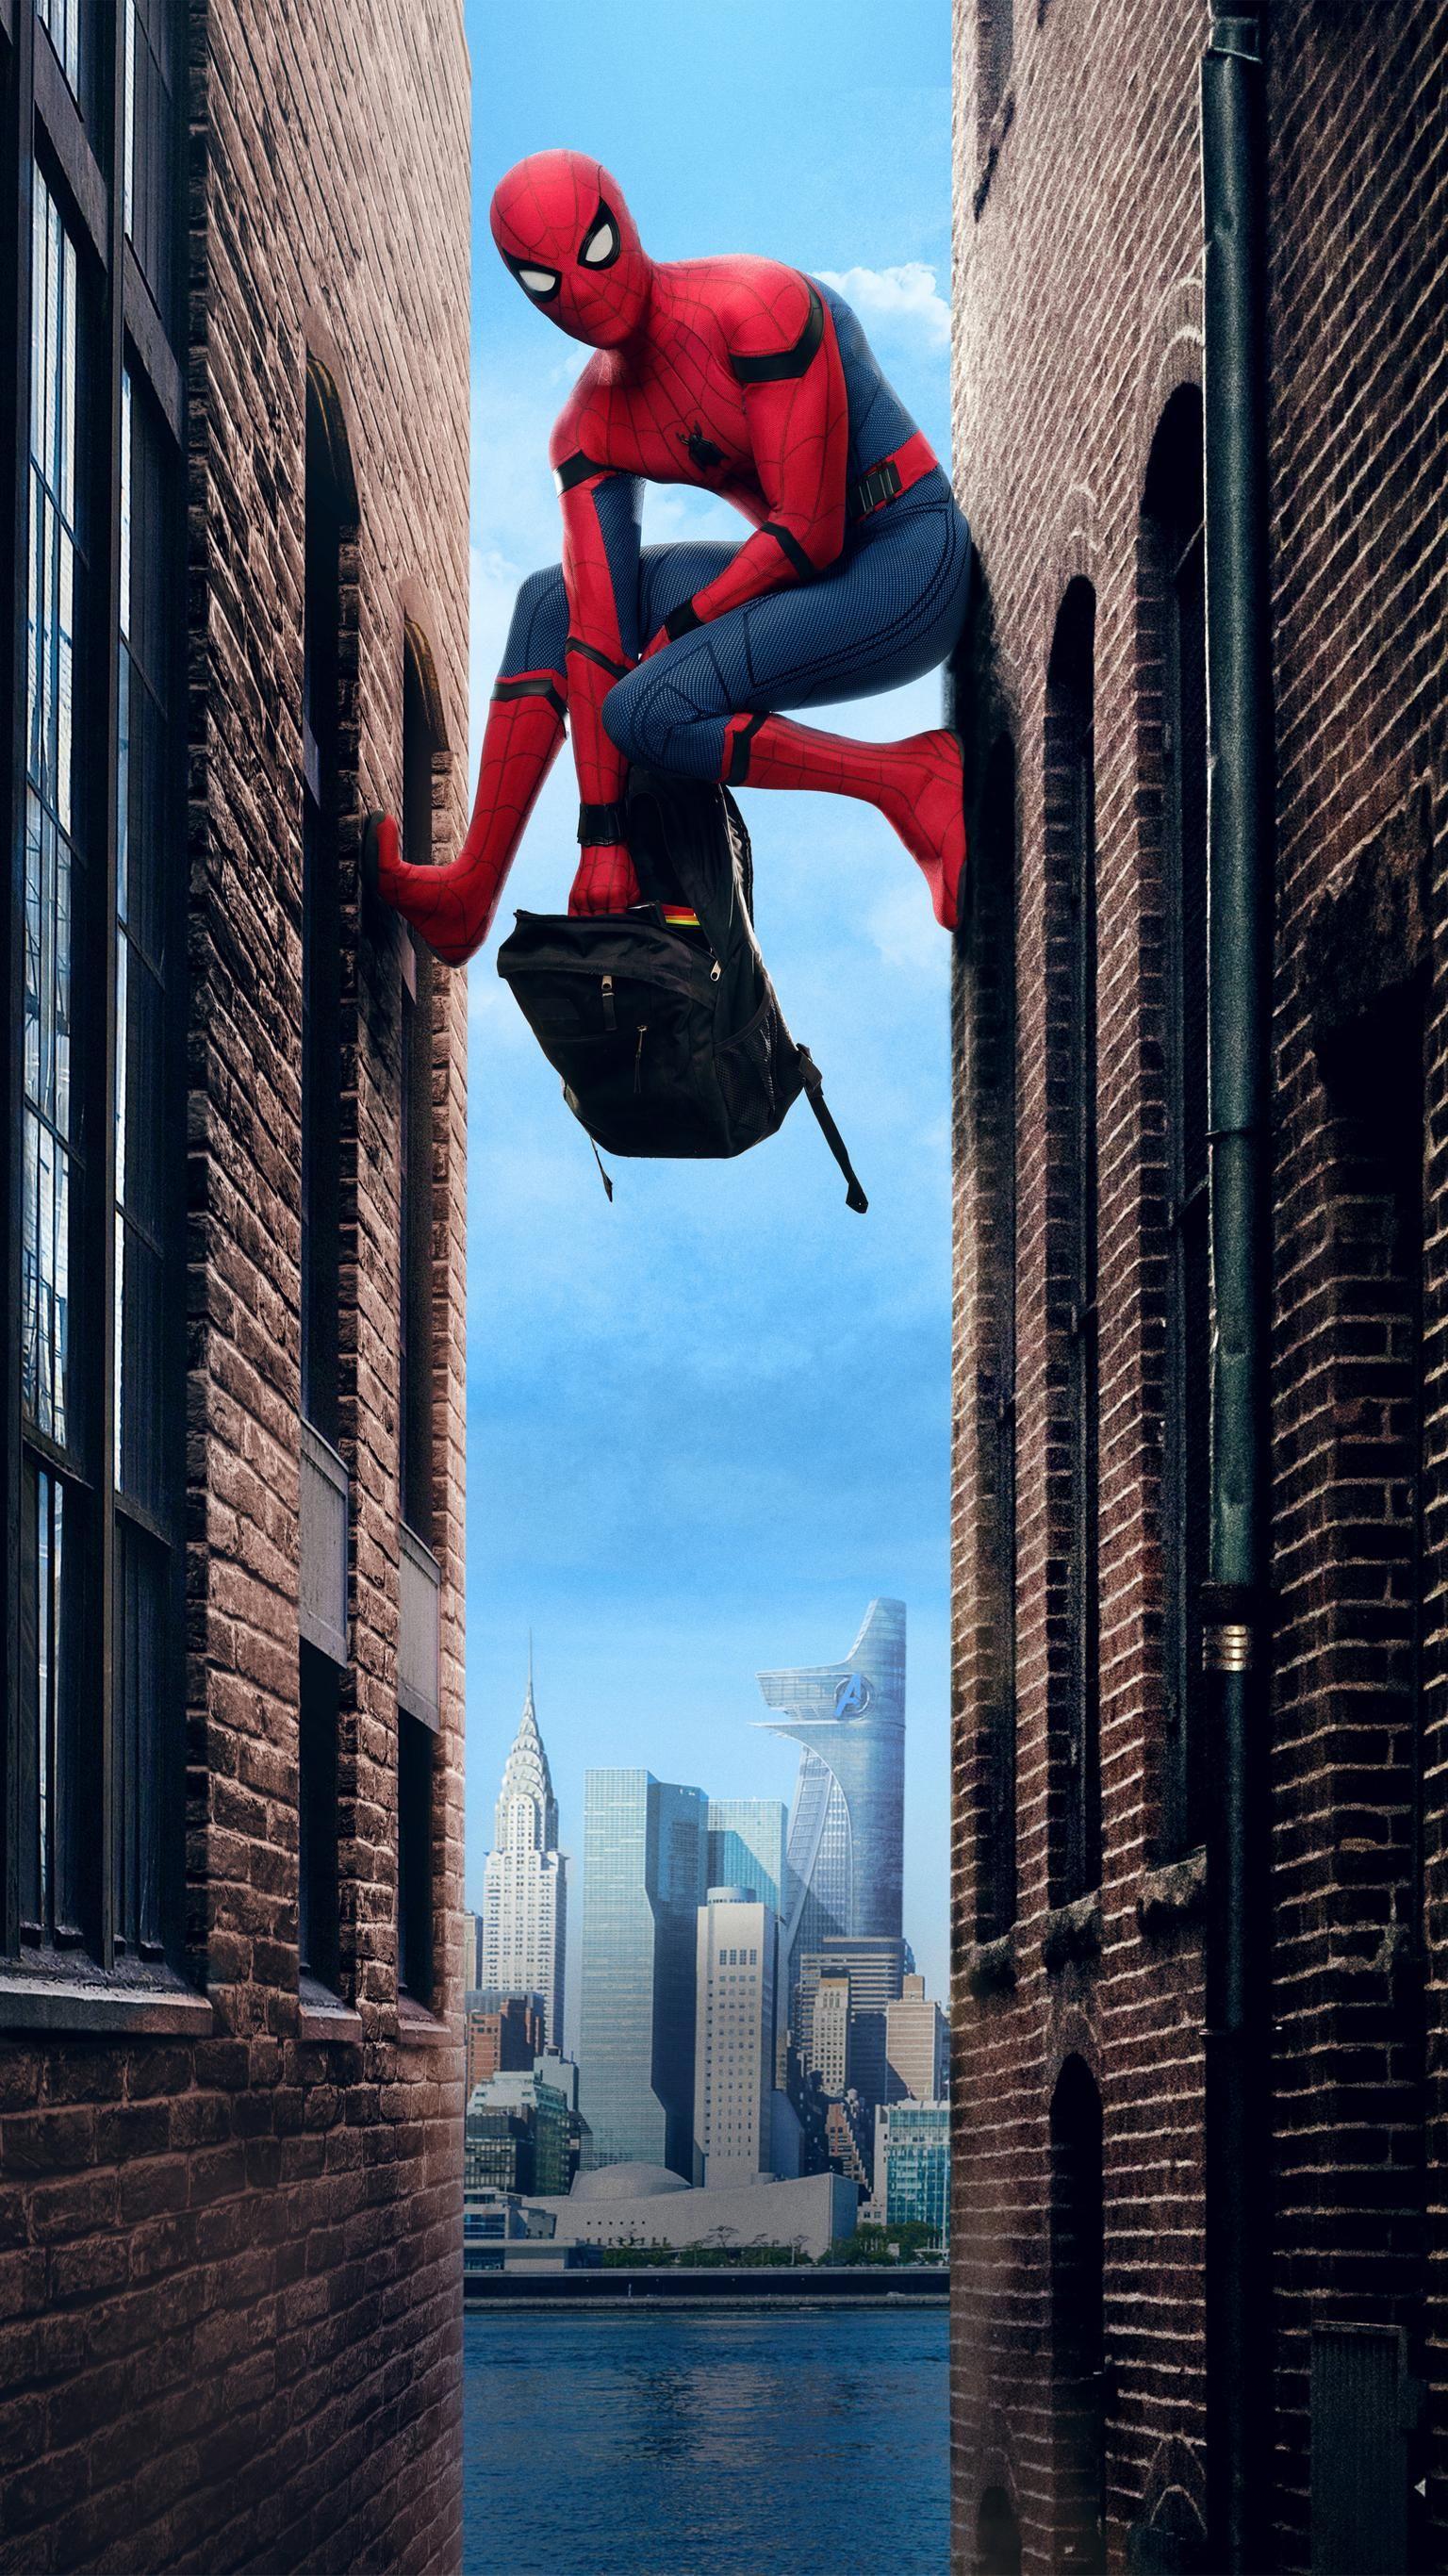 Spider Man Homecoming 2017 Phone Wallpaper Phone Wallpapers 1536x2732